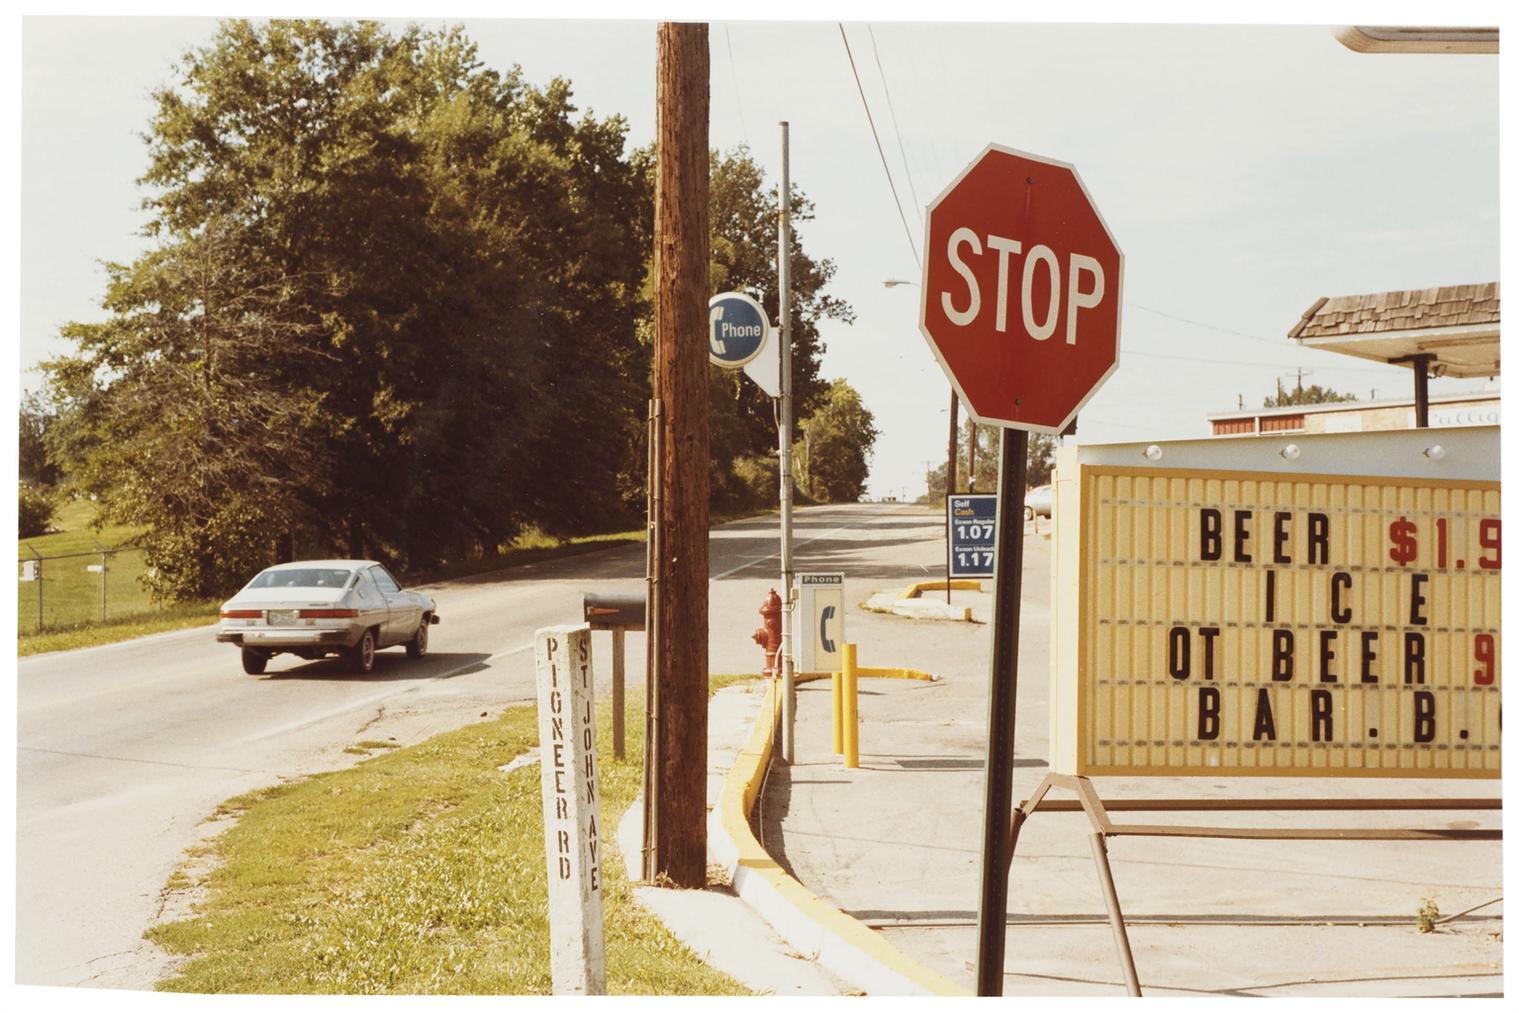 William Eggleston-Untitled (Stop Sign), 1980s-